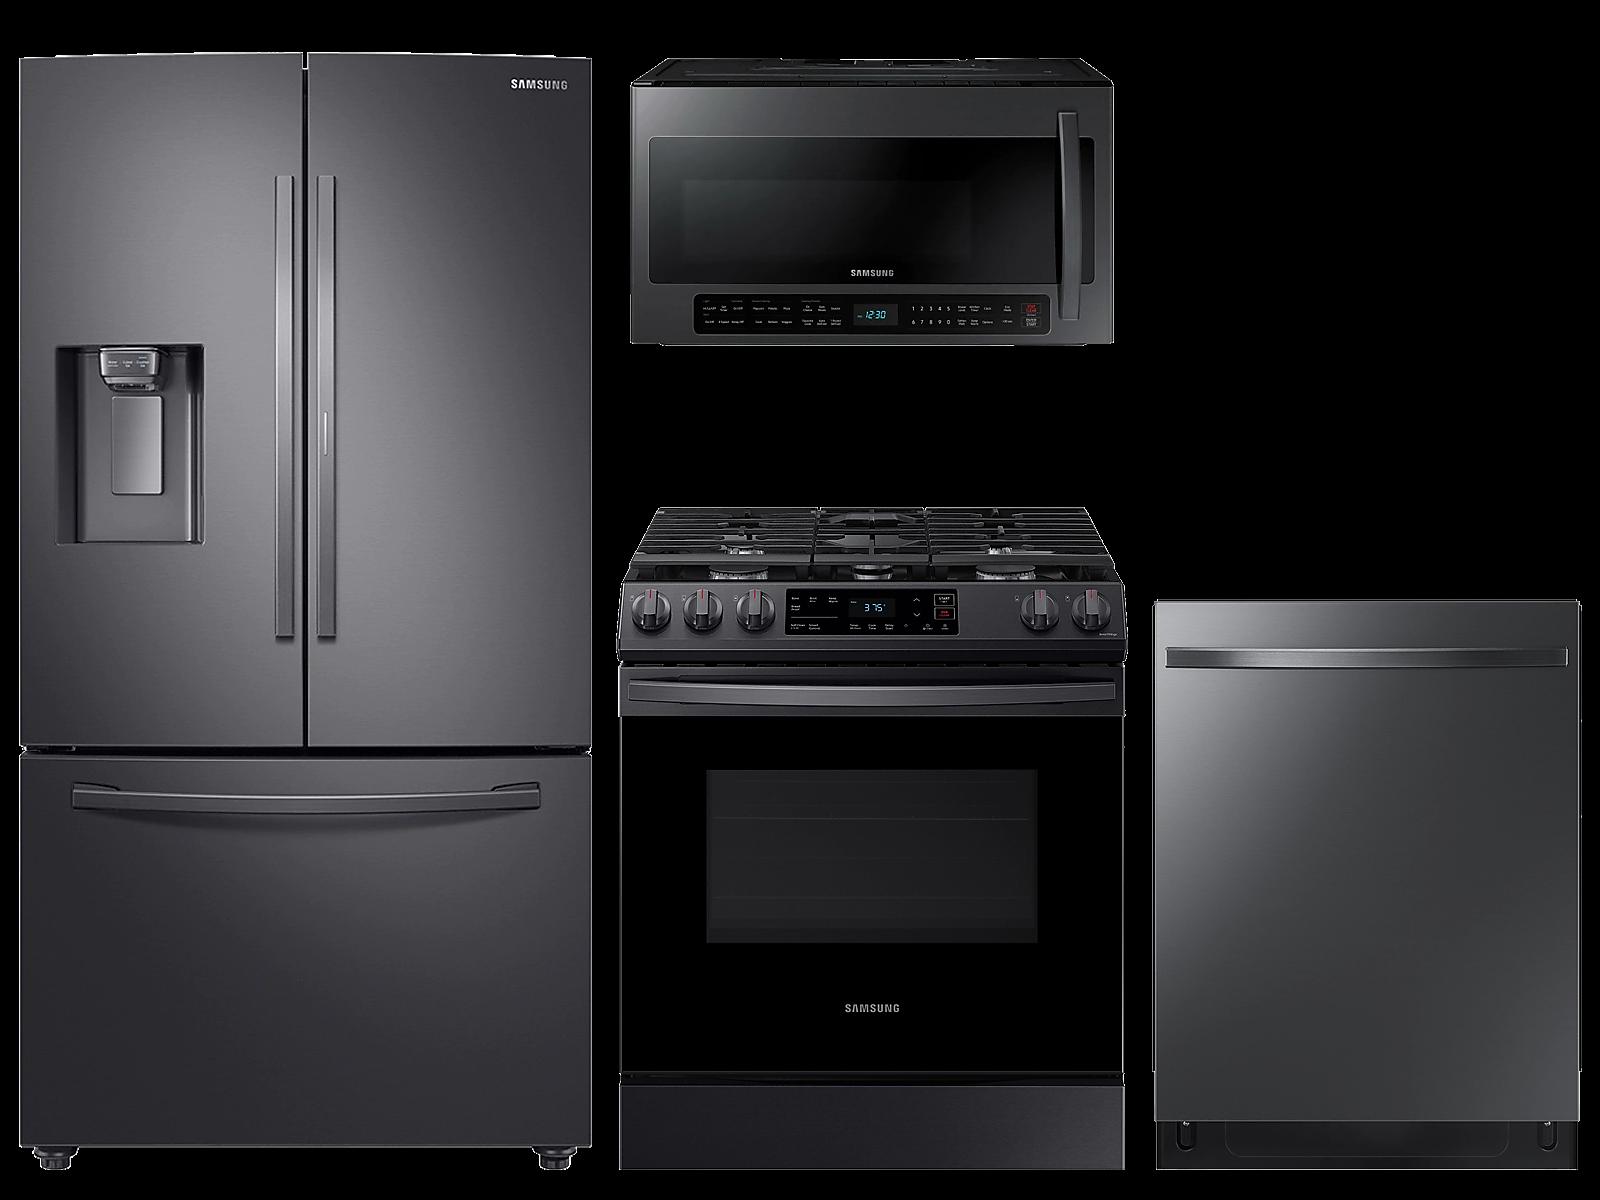 Samsung coupon: Samsung 28 cu. ft. full depth 3-door refrigerator, gas range, 2.1 cu. ft. microwave and 48 dBA modern-look dishwasher package(BNDL-1614628259525)